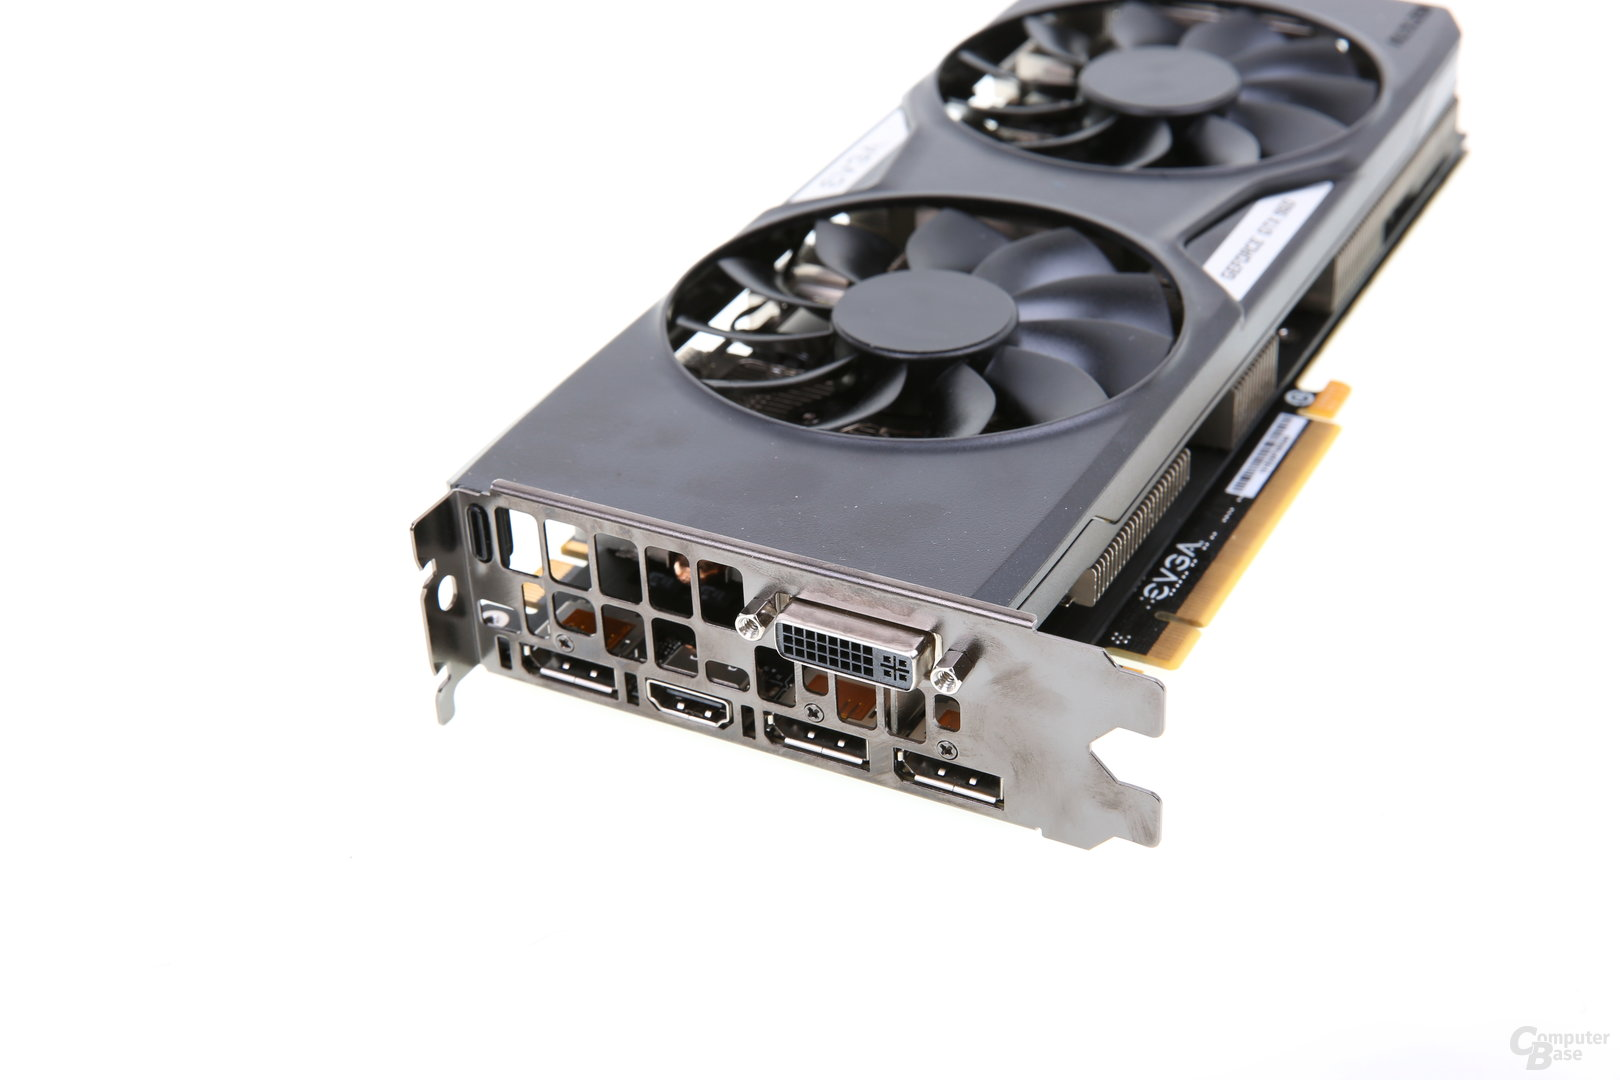 EVGA GeForce GTX 960 SuperSC - Anschlüsse